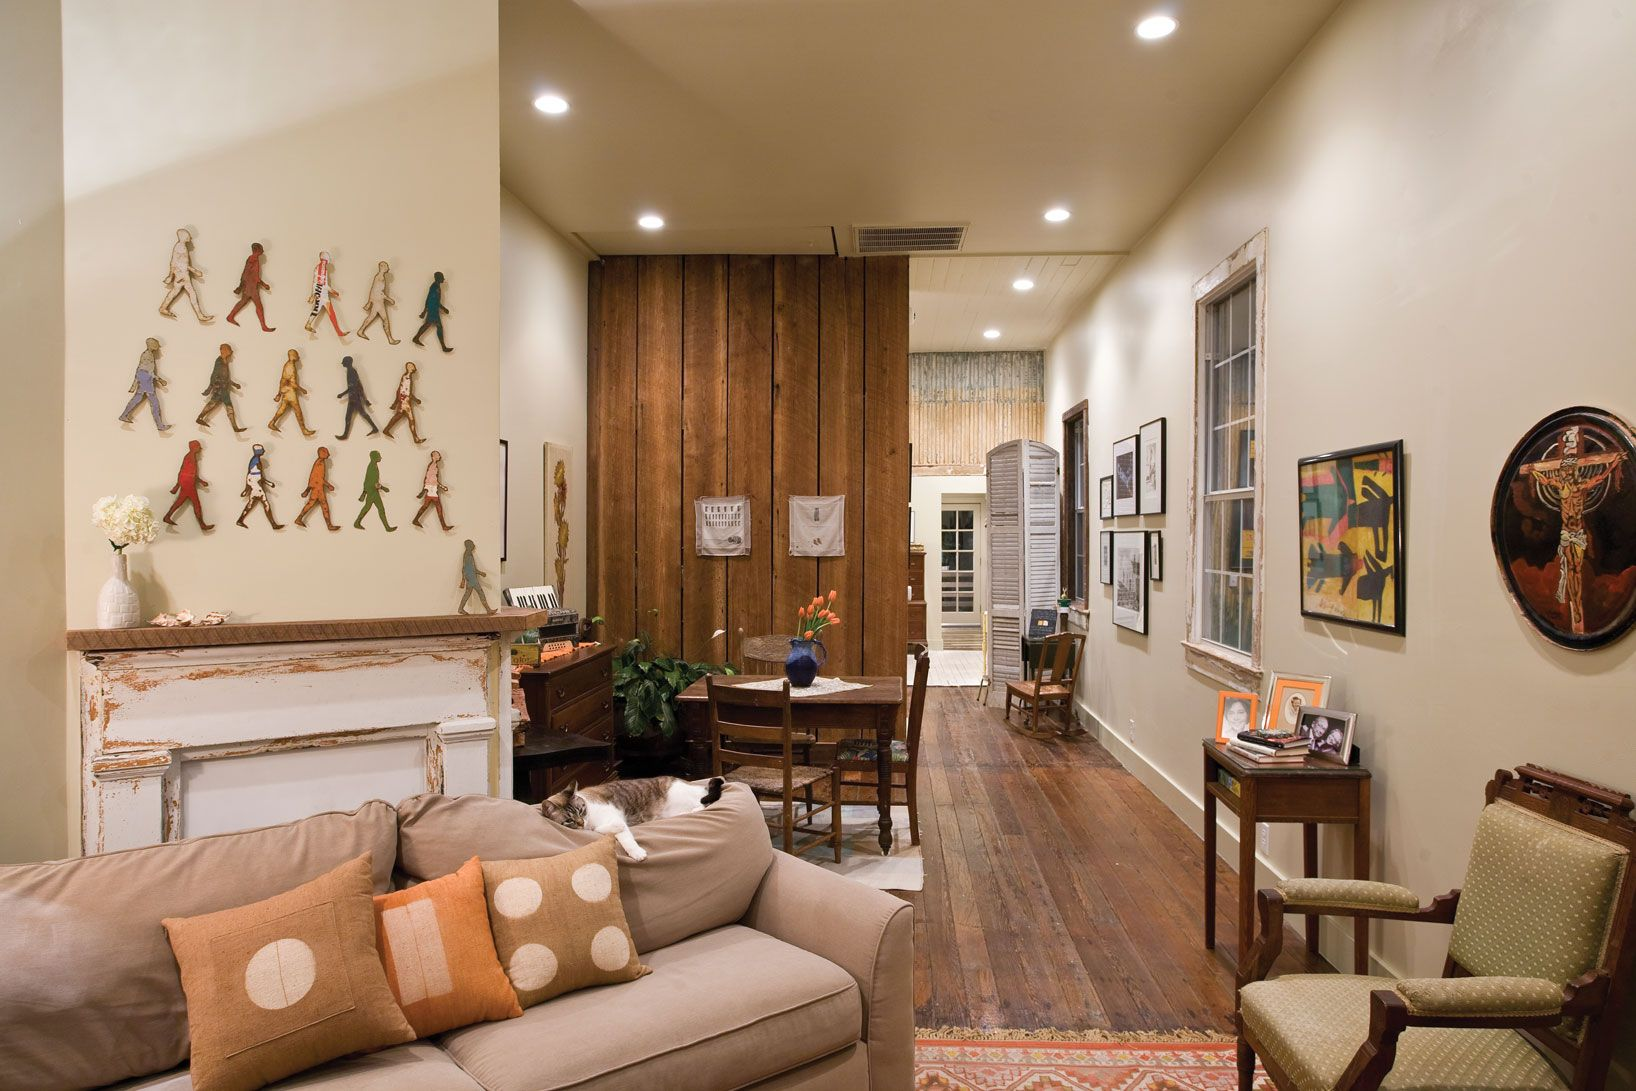 Shotgun Homes Interiors The House That Art Built New Orleans Lifestyles